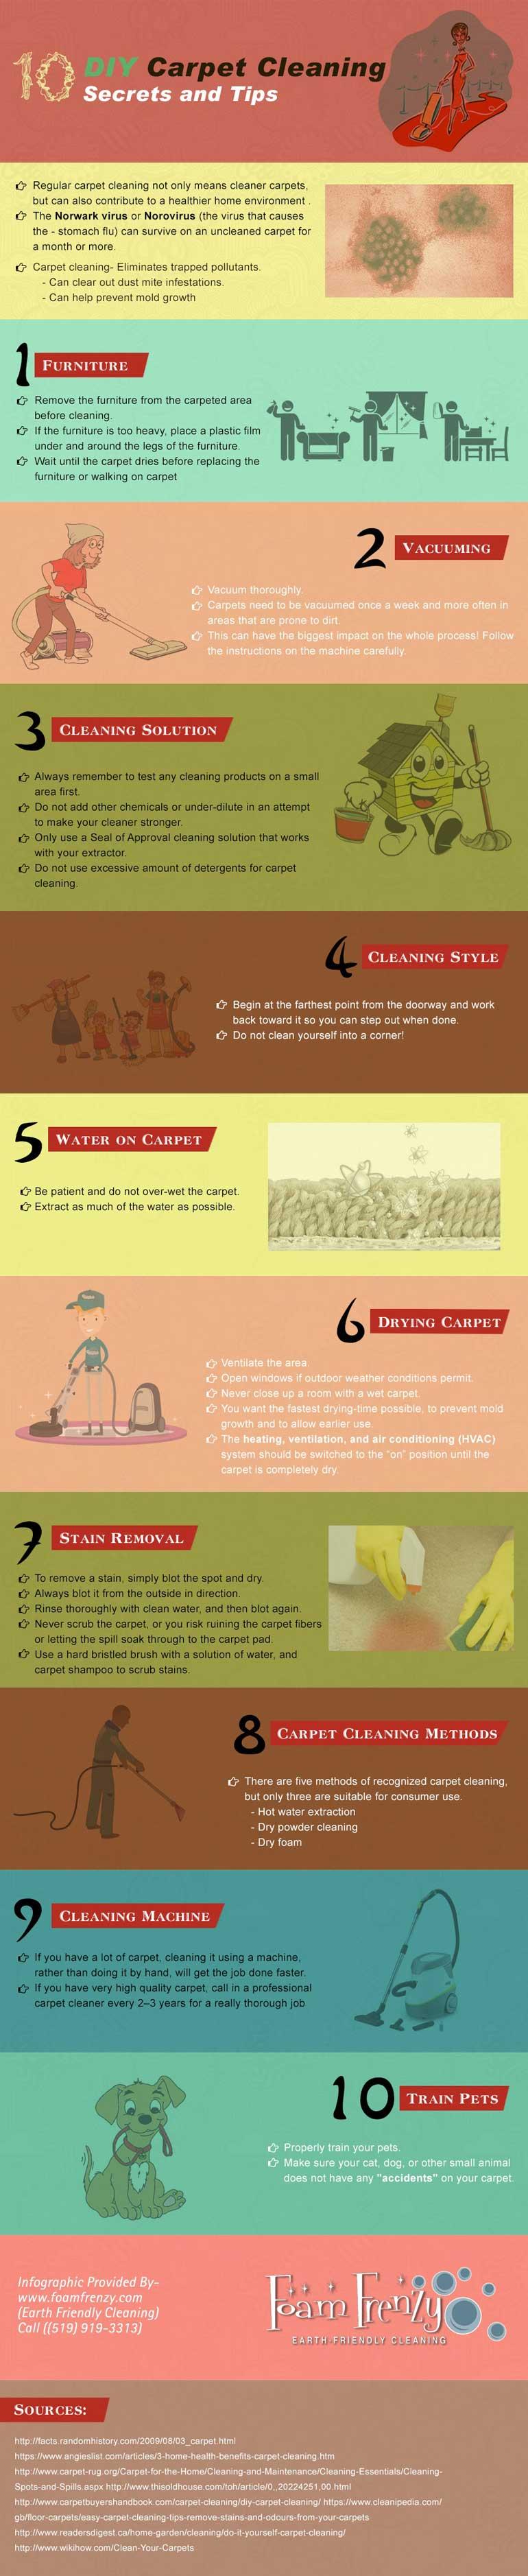 Diy Carpet Cleaning Tips